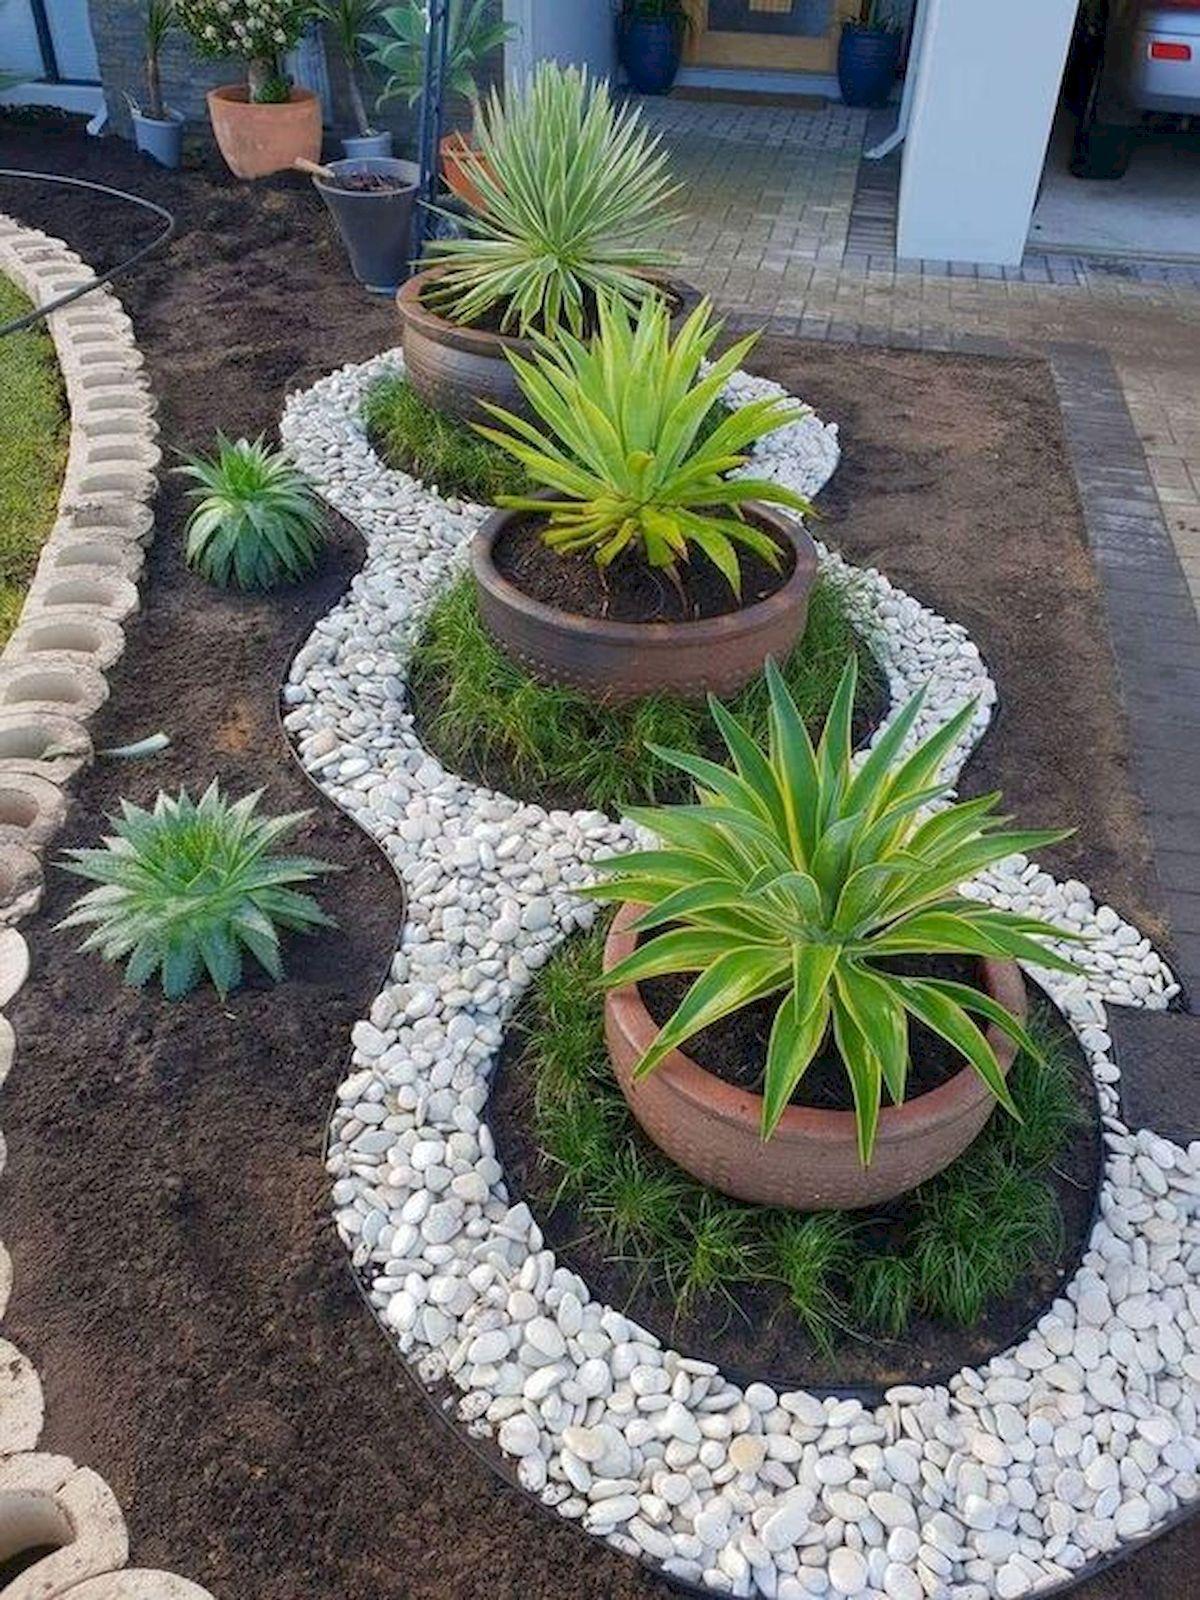 90 Beautiful Backyard Garden Design Ideas For Summer 30 Worldecor Co In 2020 Rock Garden Landscaping Garden Decor Projects Backyard Garden Design